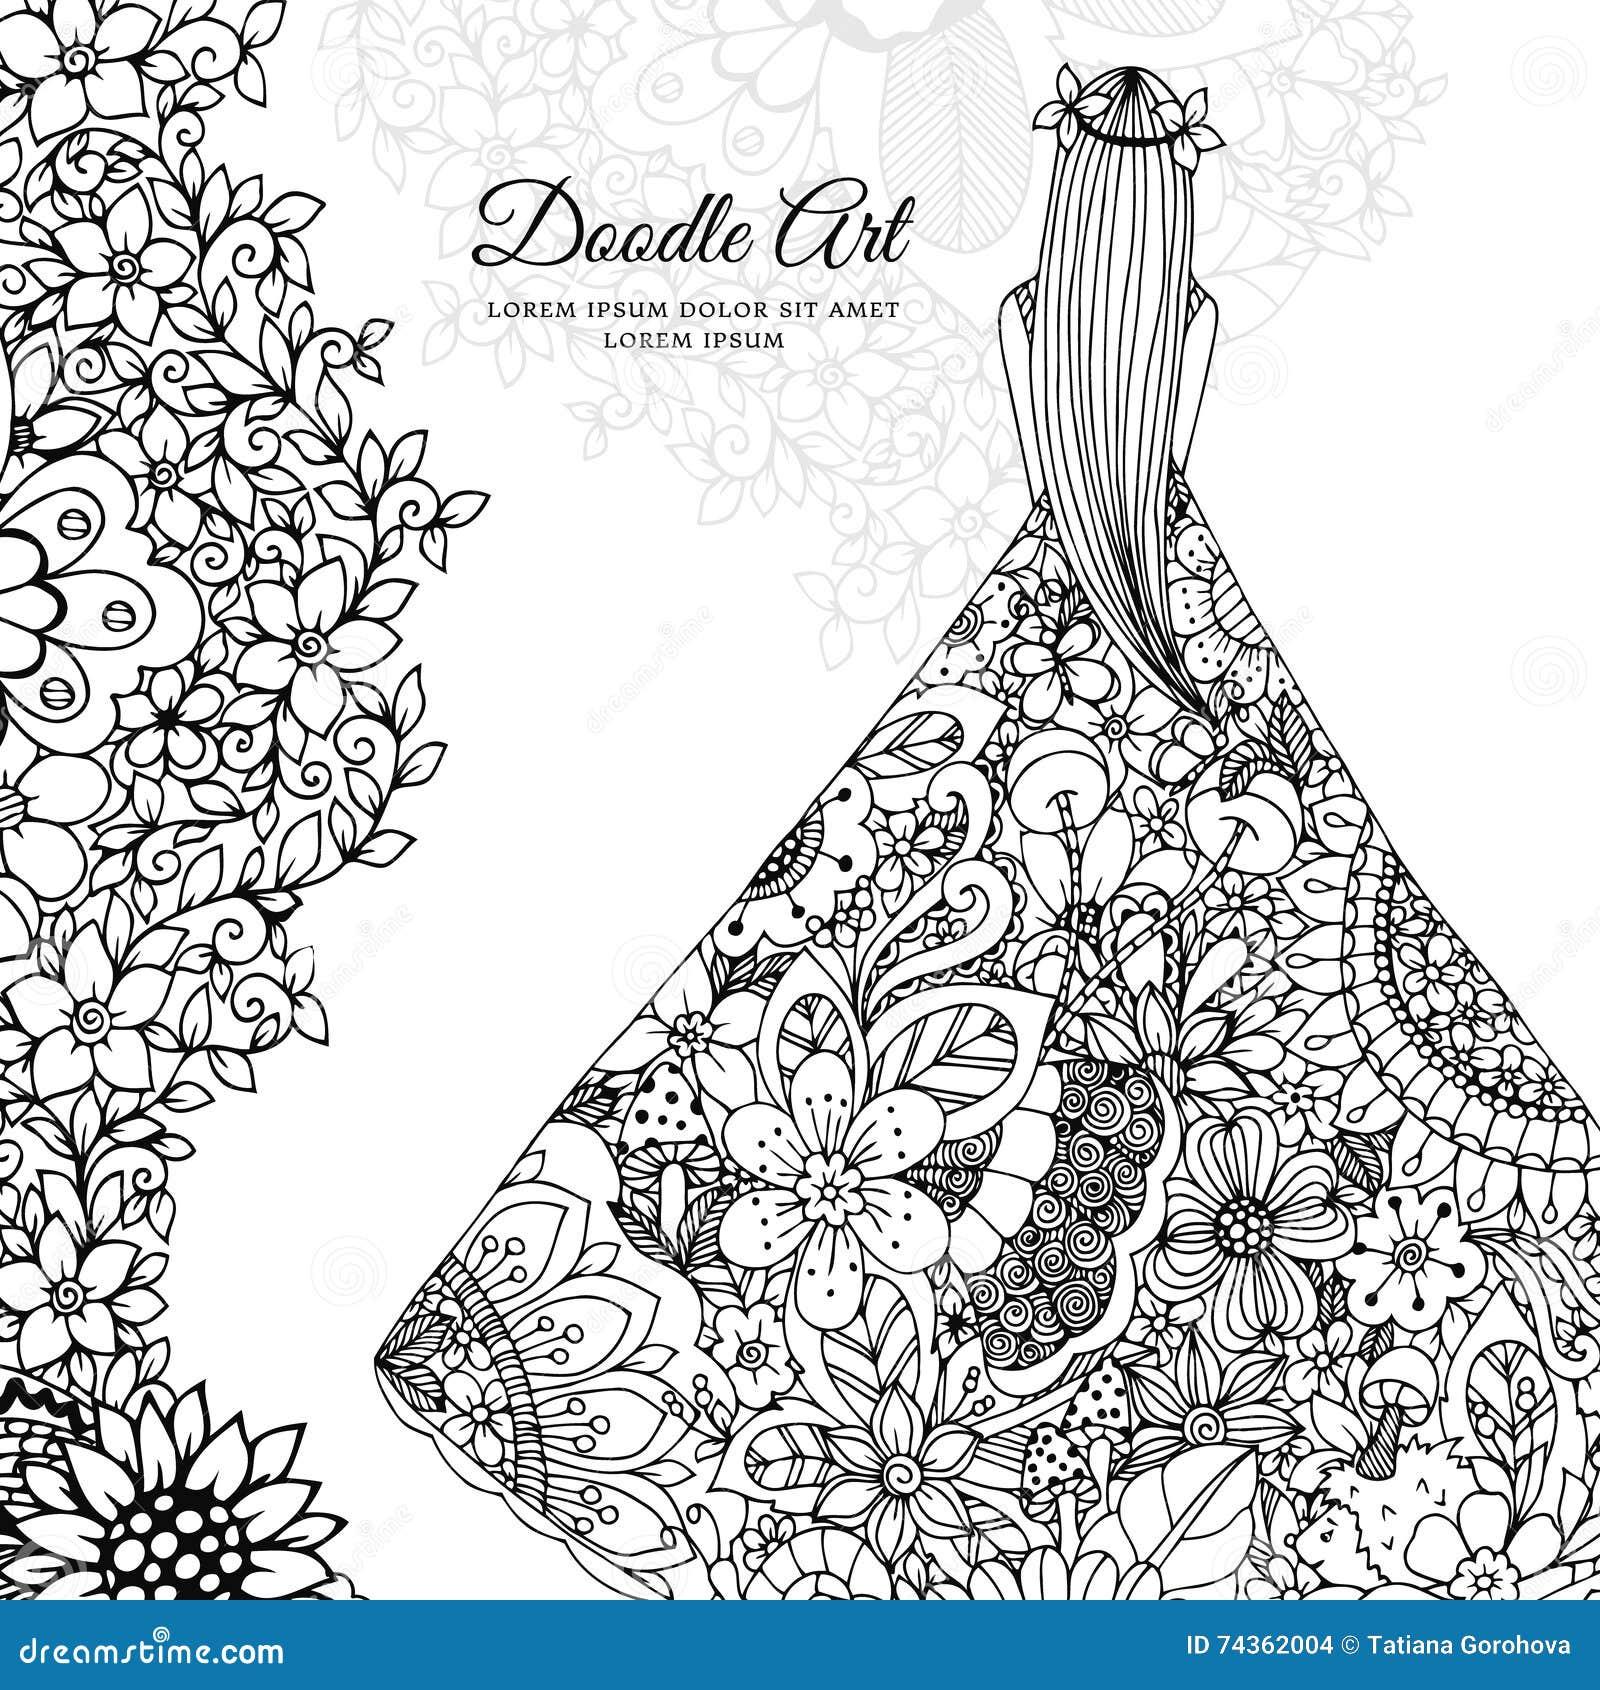 Vector Illustration Zen Tangle Girl In A Floral Dress